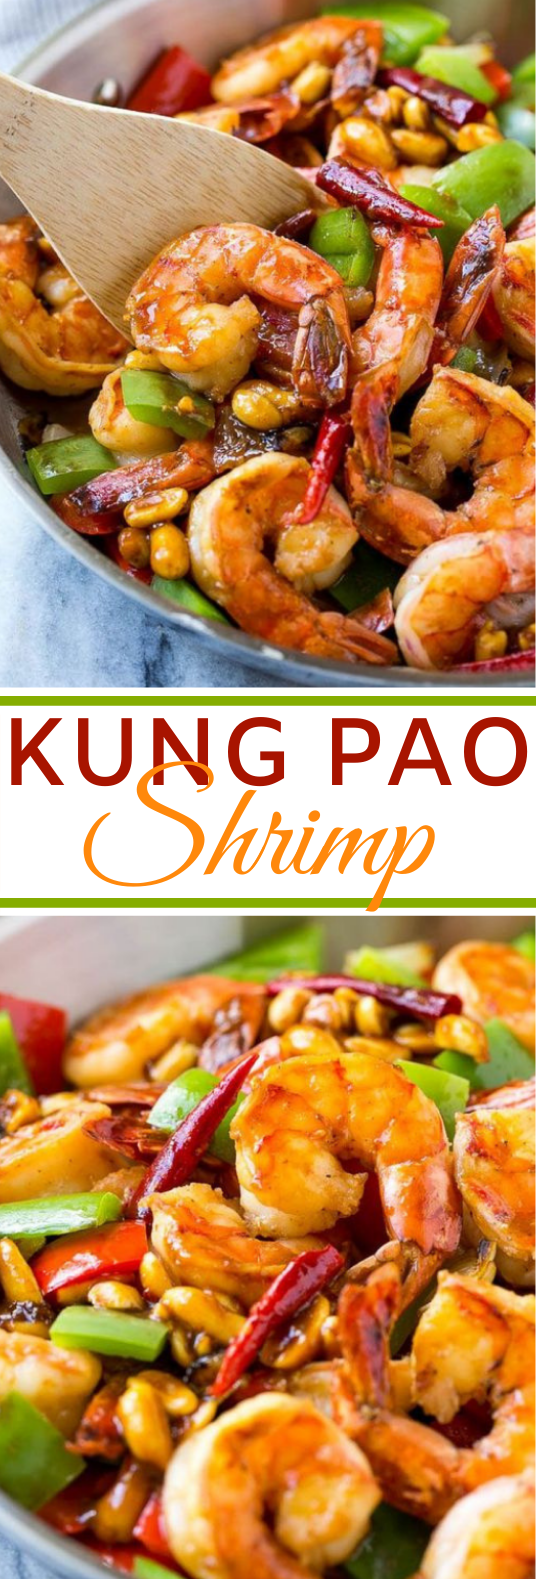 KUNG PAO SHRIMP #chinese #recipe #shrimp #dinner #weeknight